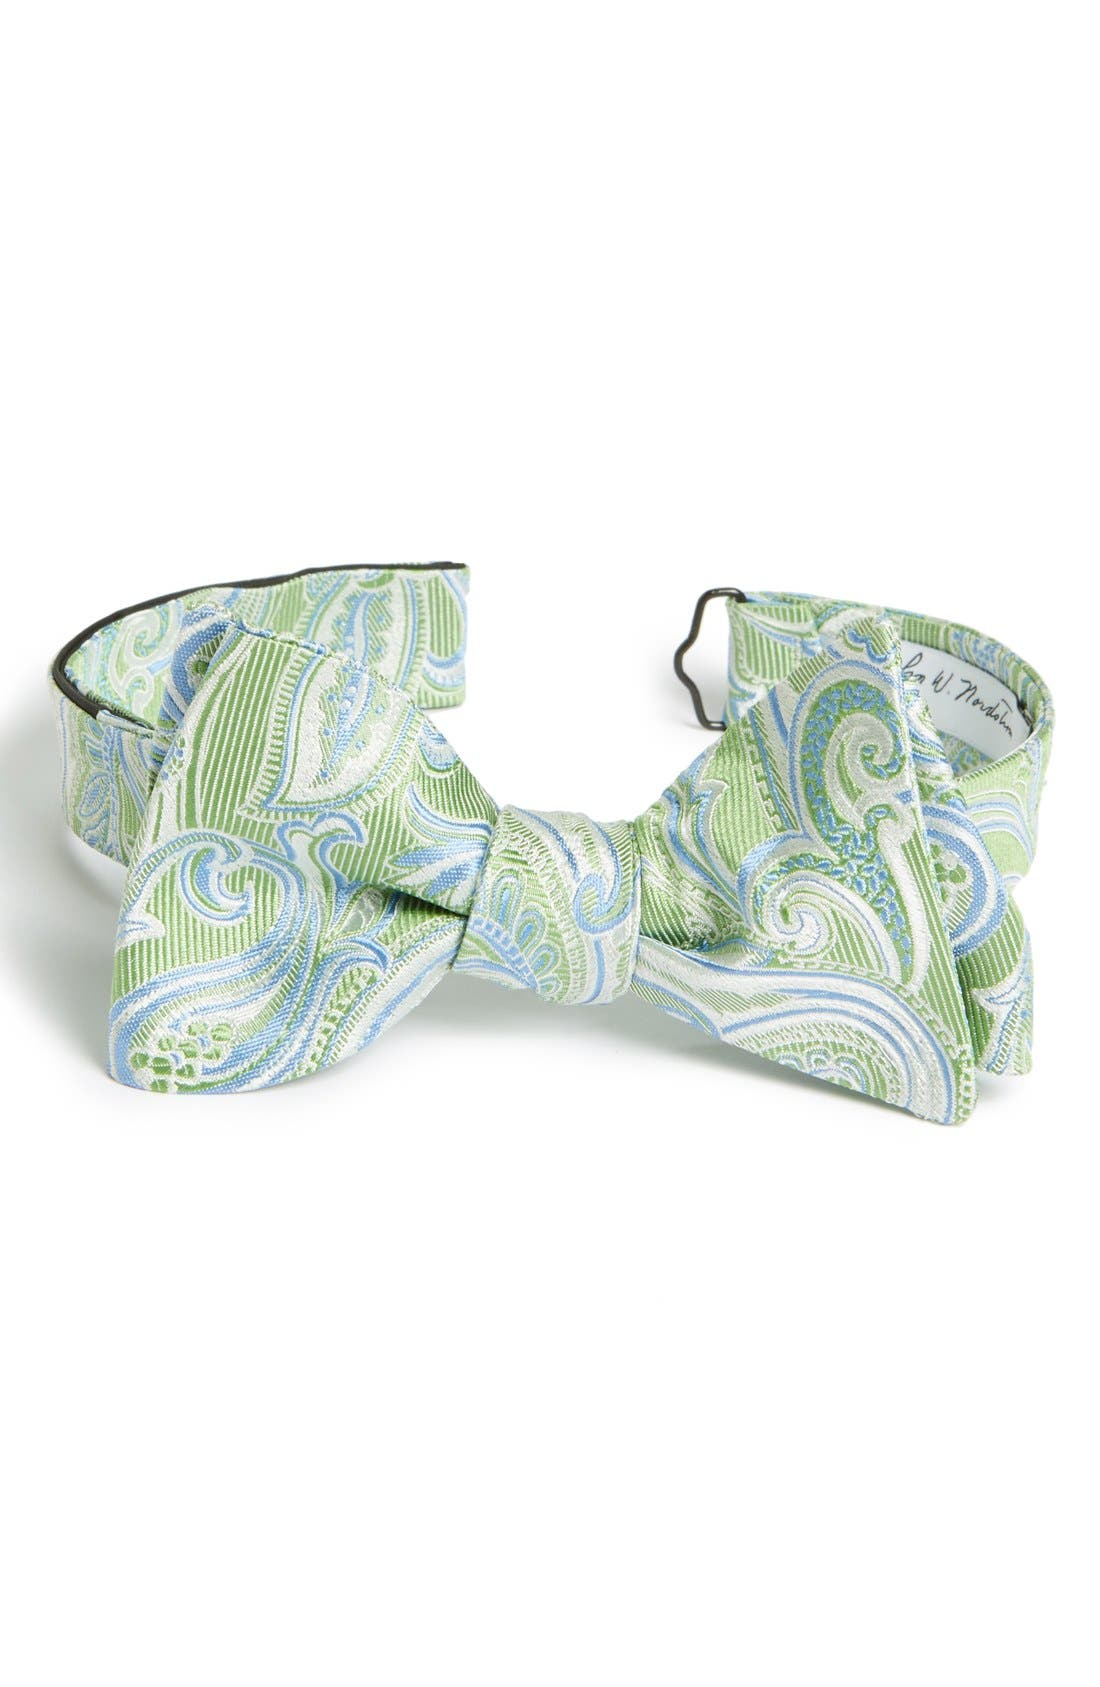 Main Image - John W. Nordstrom® Silk Bow Tie